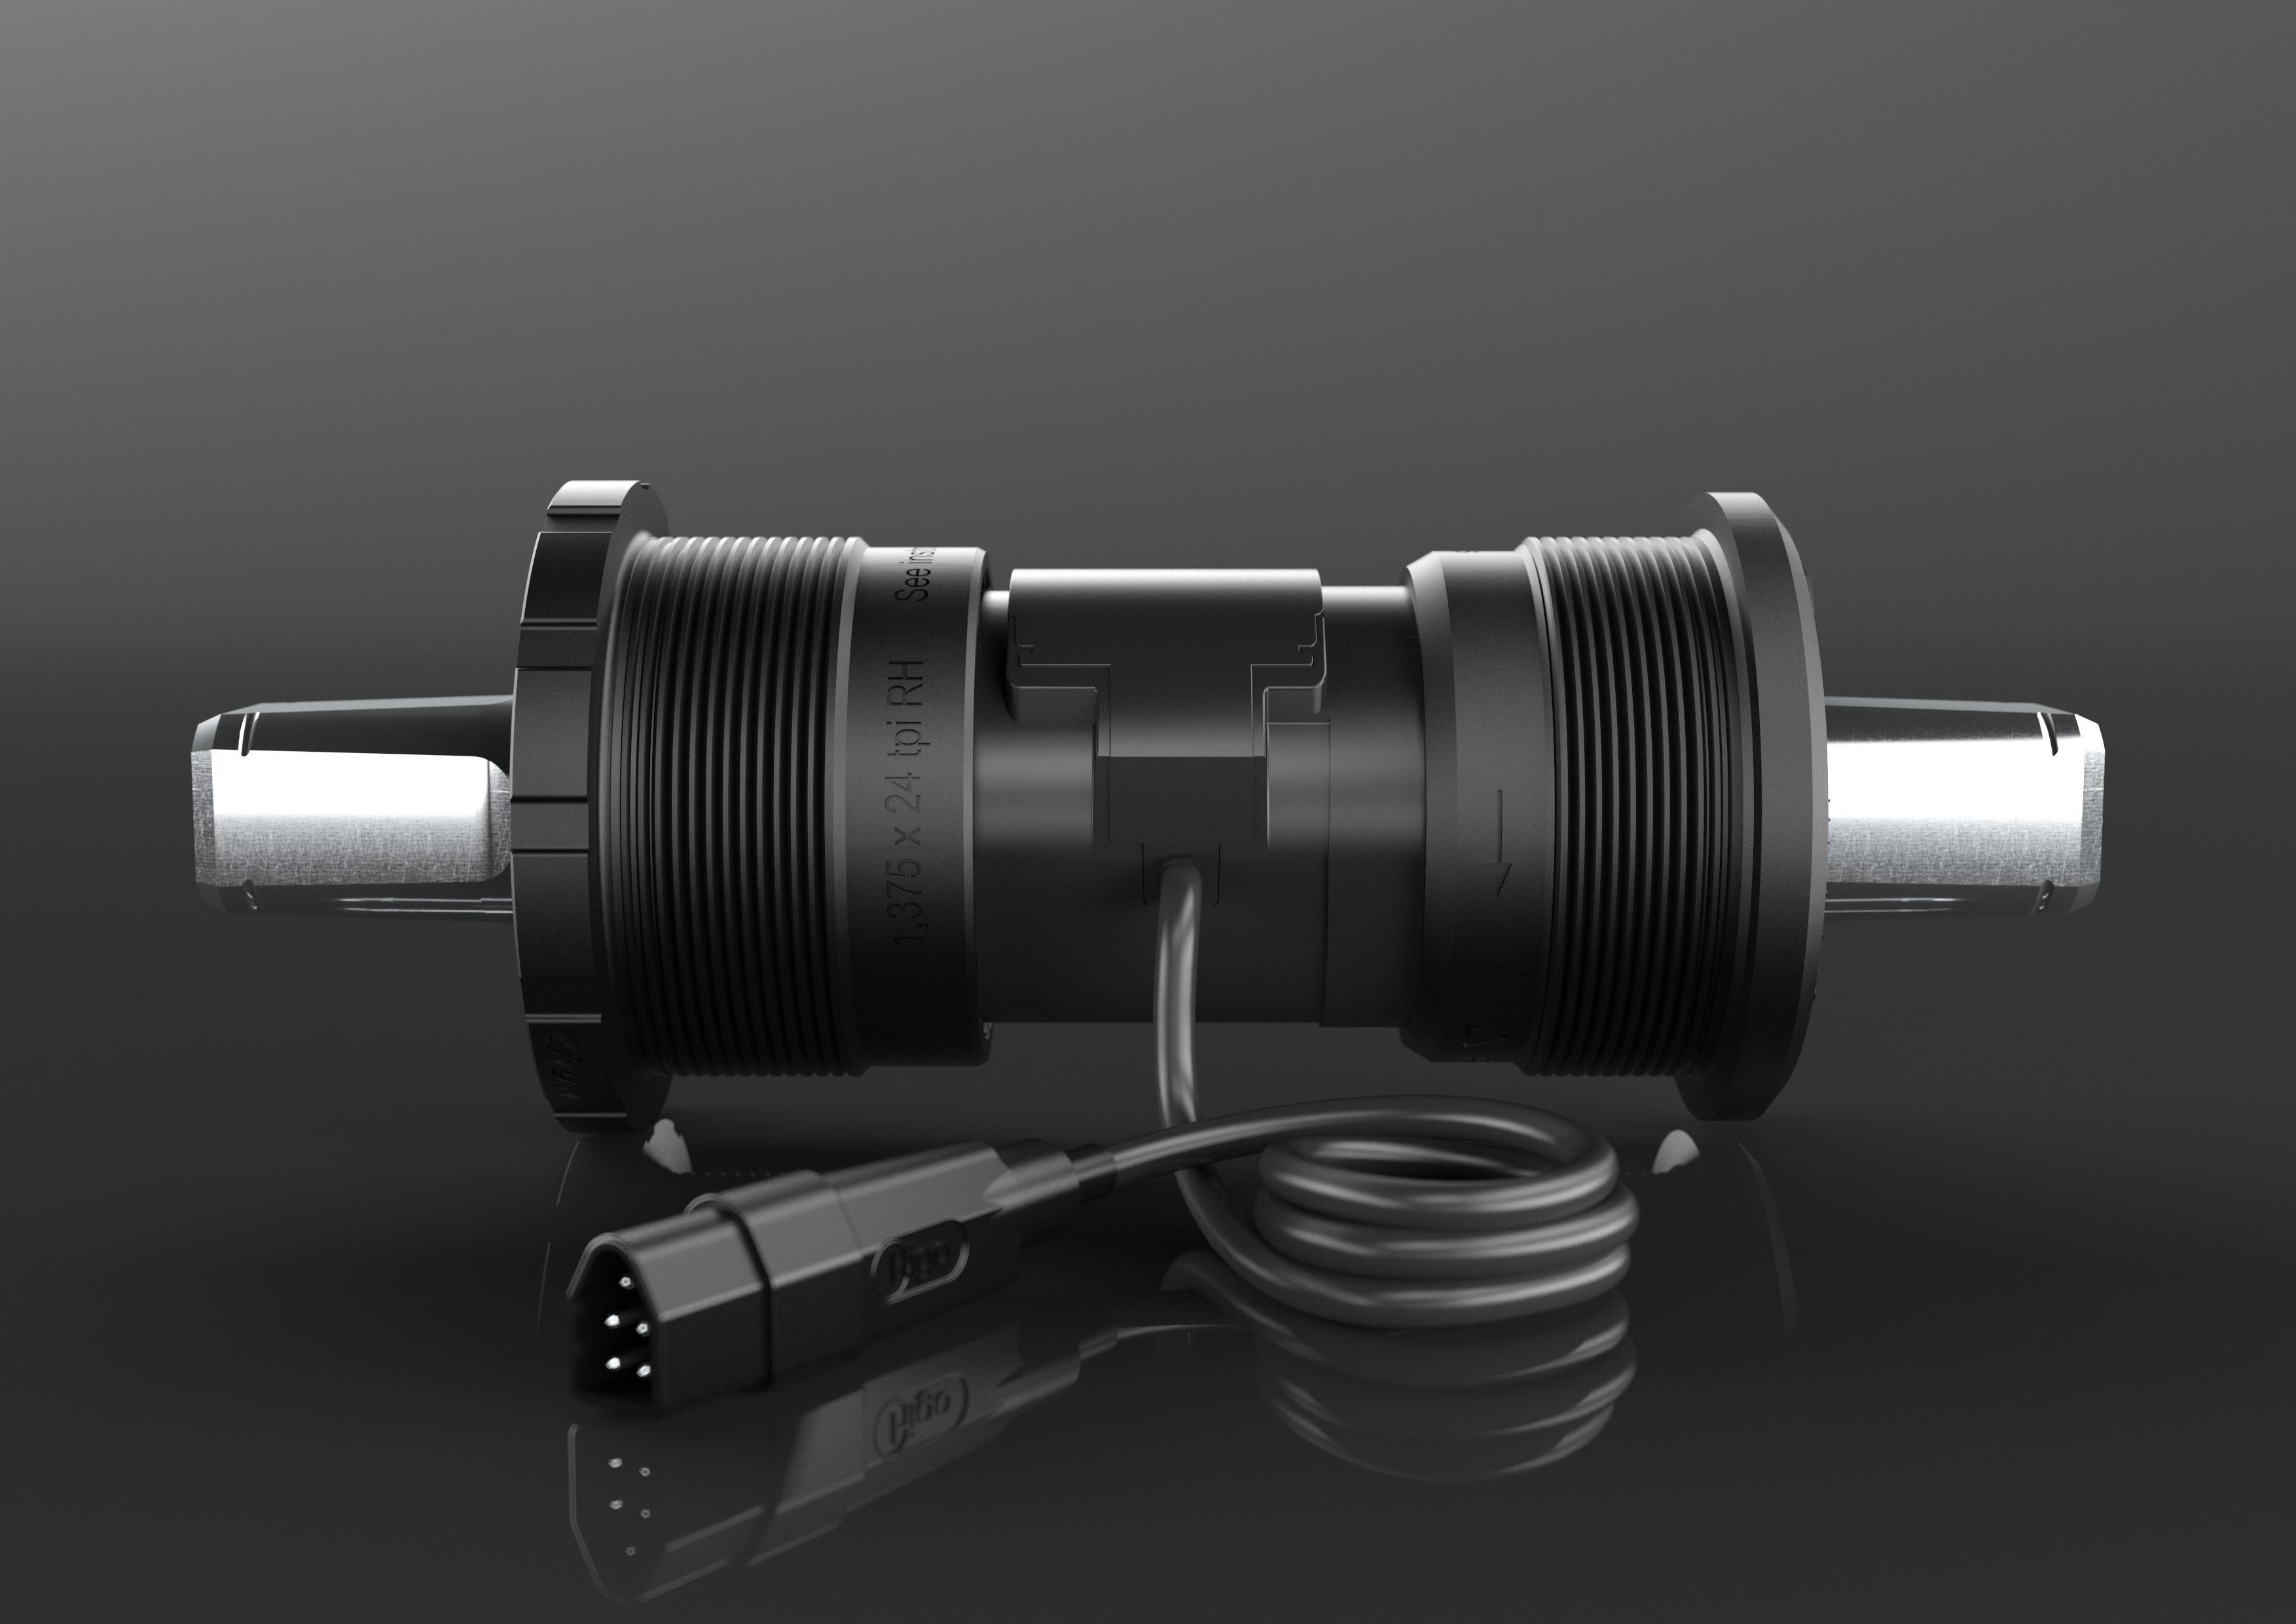 2x Thun X-Cell RT digital 128K//123mm